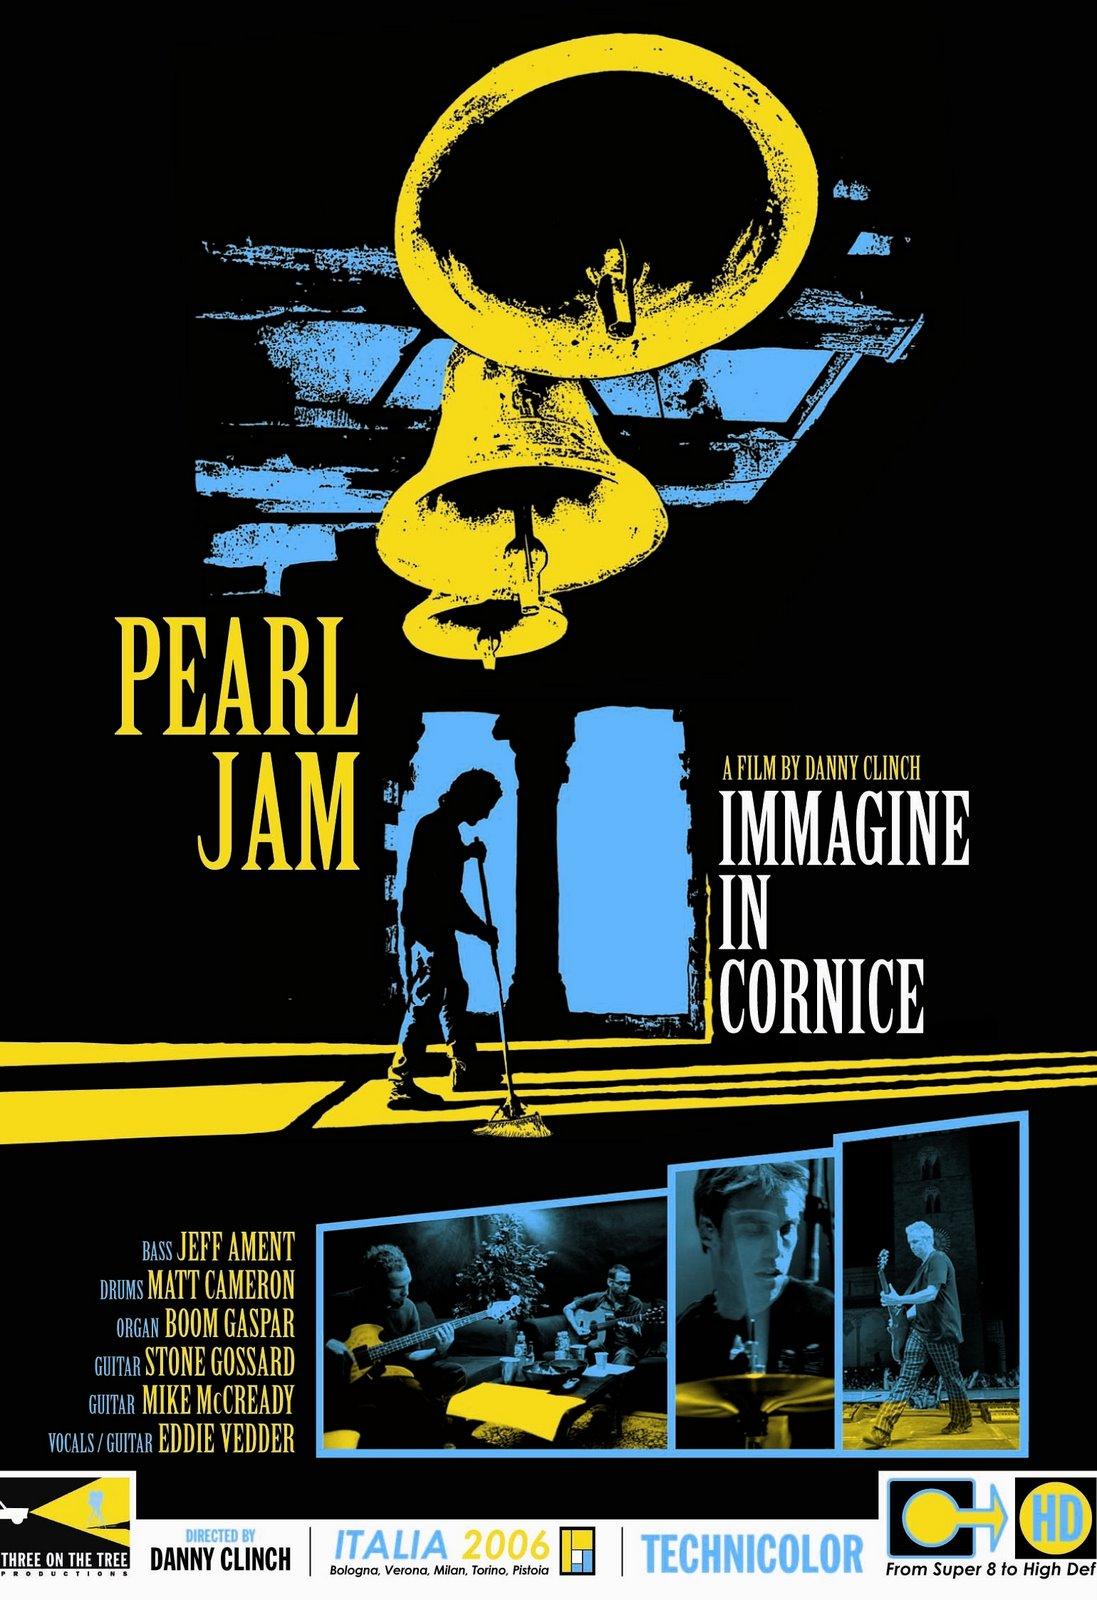 http://www.pearljam.pl/images/2007/08/pearl_jam_cov_rev.JPG